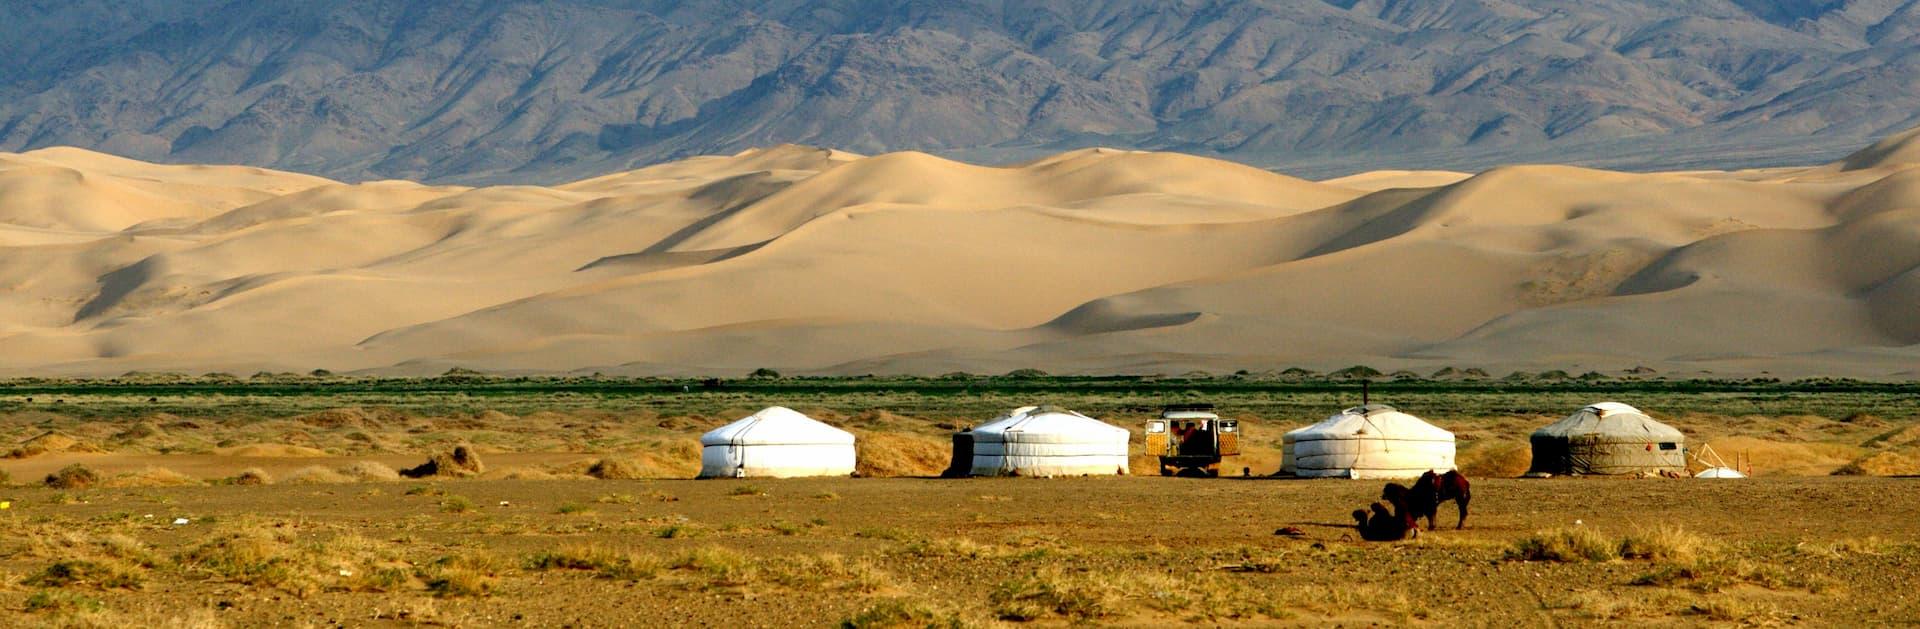 Nomadic Tours And Travel